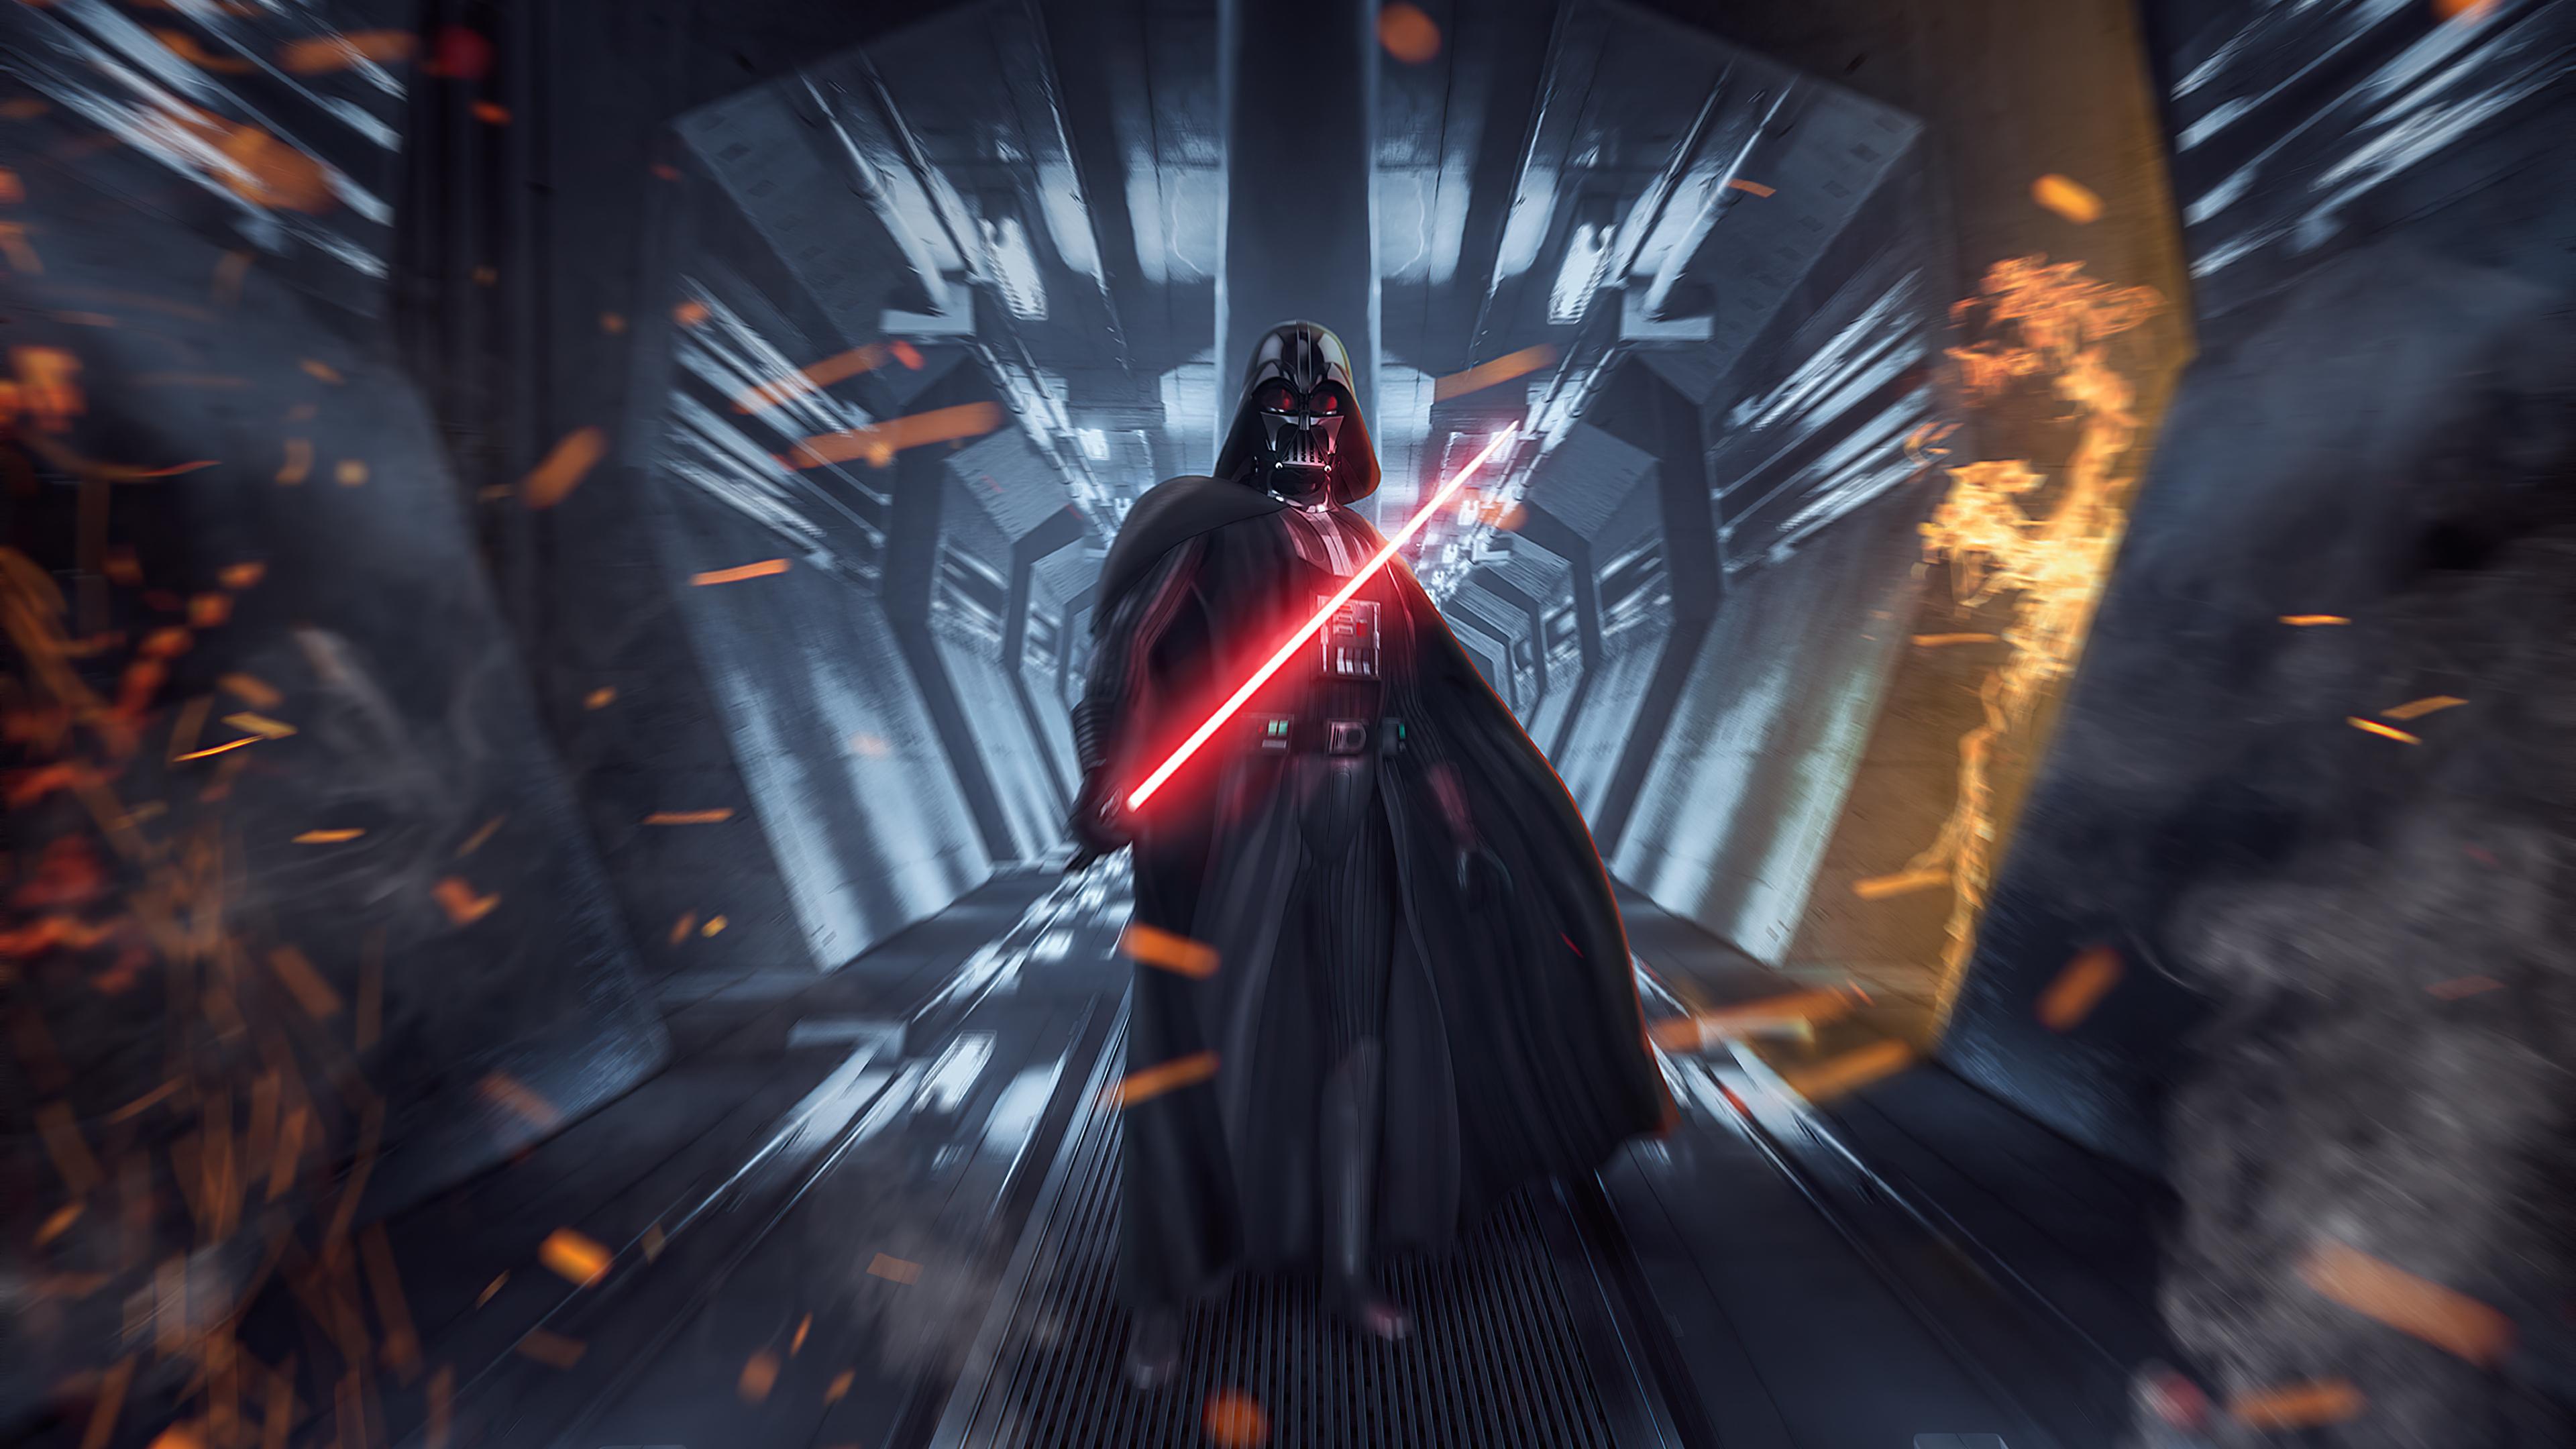 Download 3840x2160 Wallpaper Darth Vader Star Wars Dark Forces Video Game Art 4k Uhd 16 9 Widescreen 3840x2160 Hd Image Background 25026